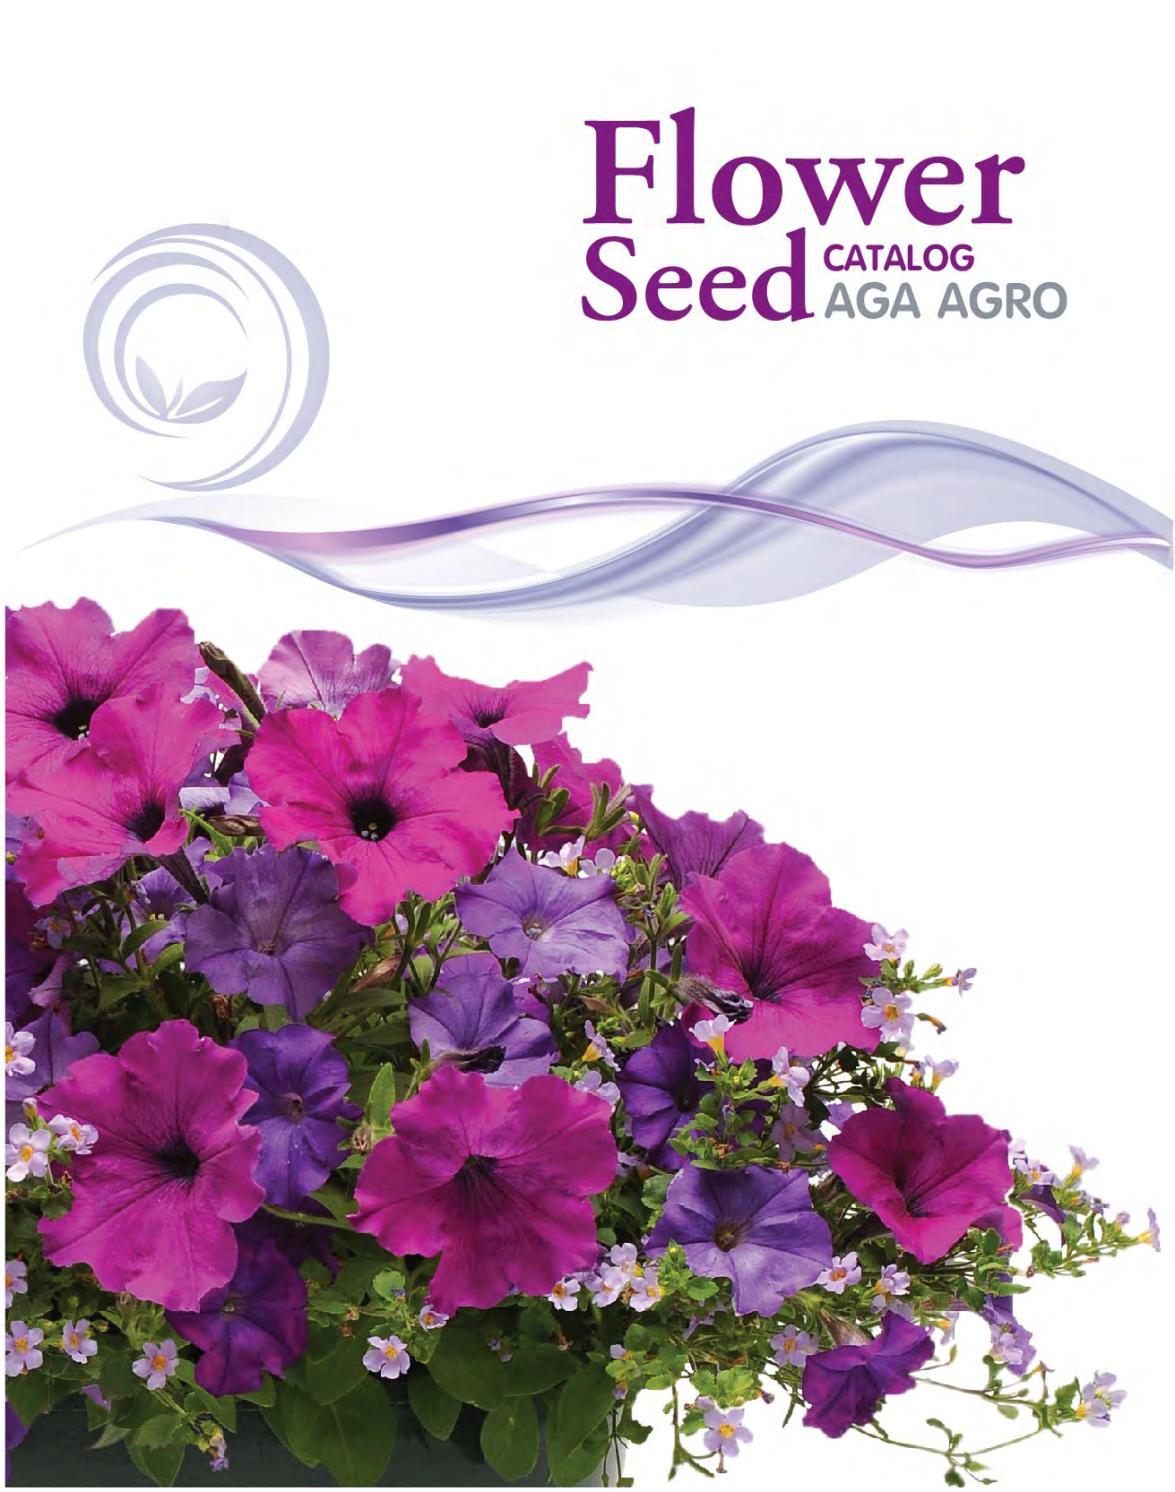 Aga flower seed catalog for International by Aga Agro - issuu